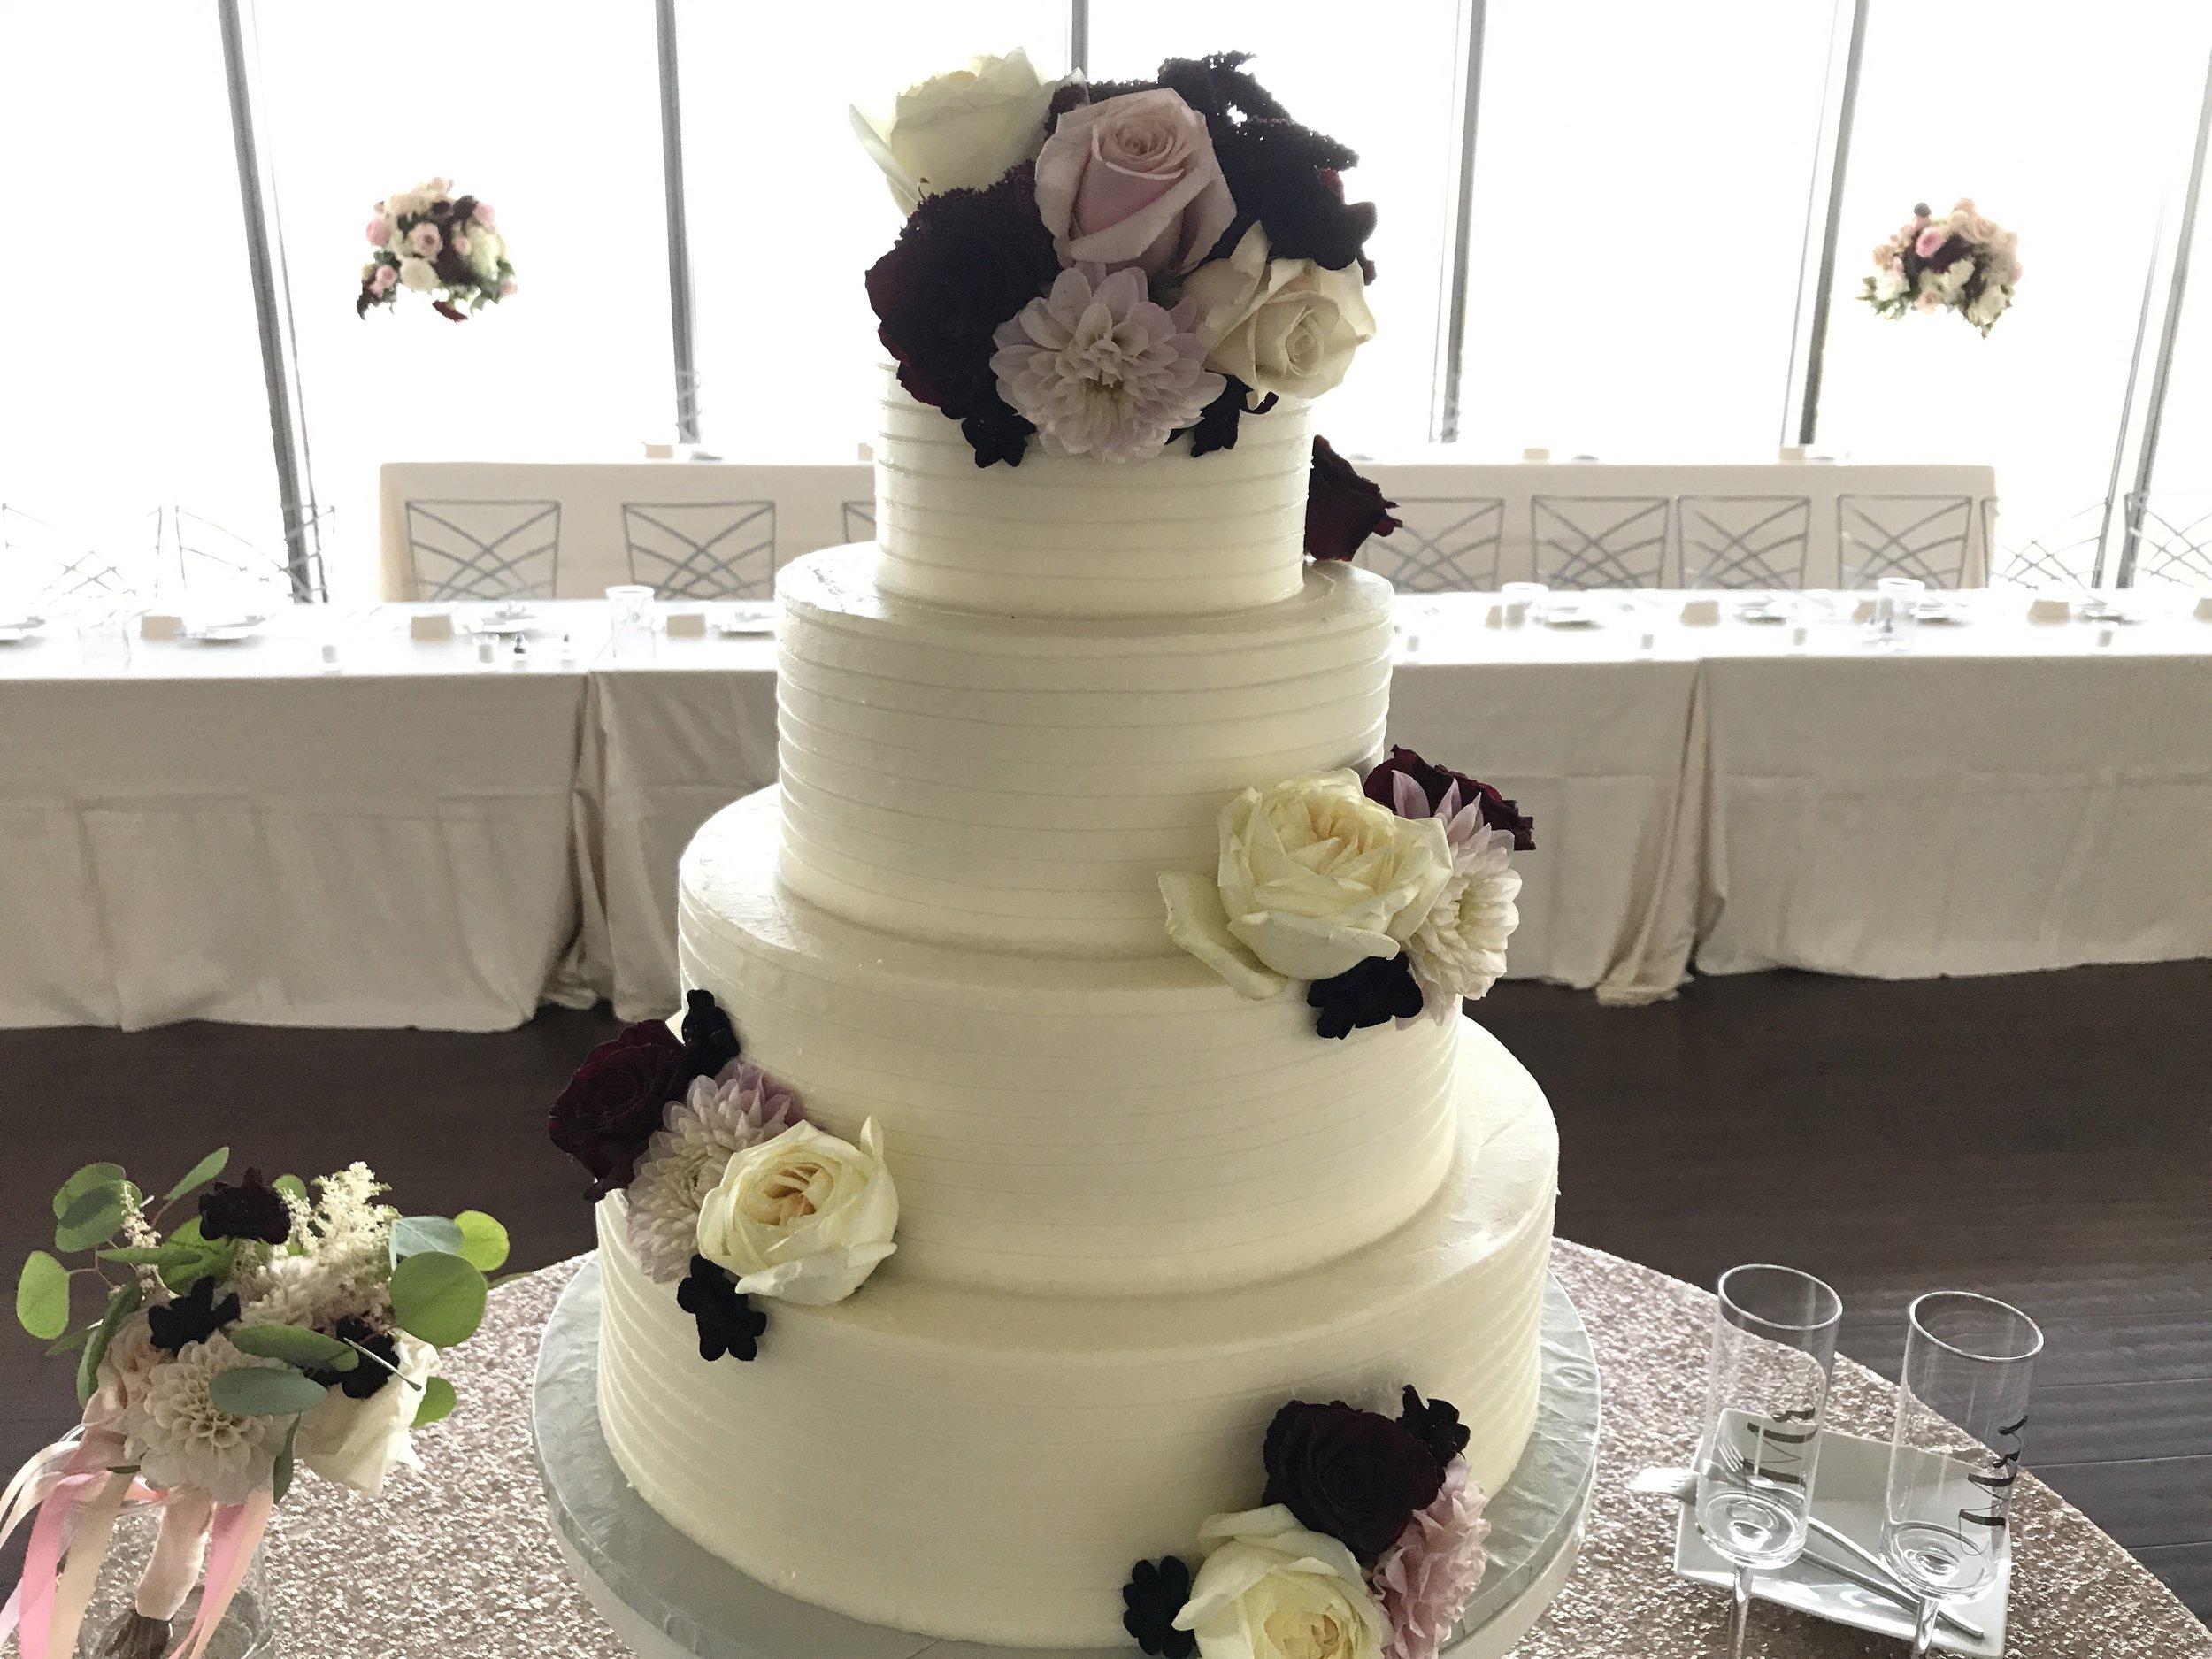 Cake by Classic Cakes Carmel, Flowers by McNamara Indy